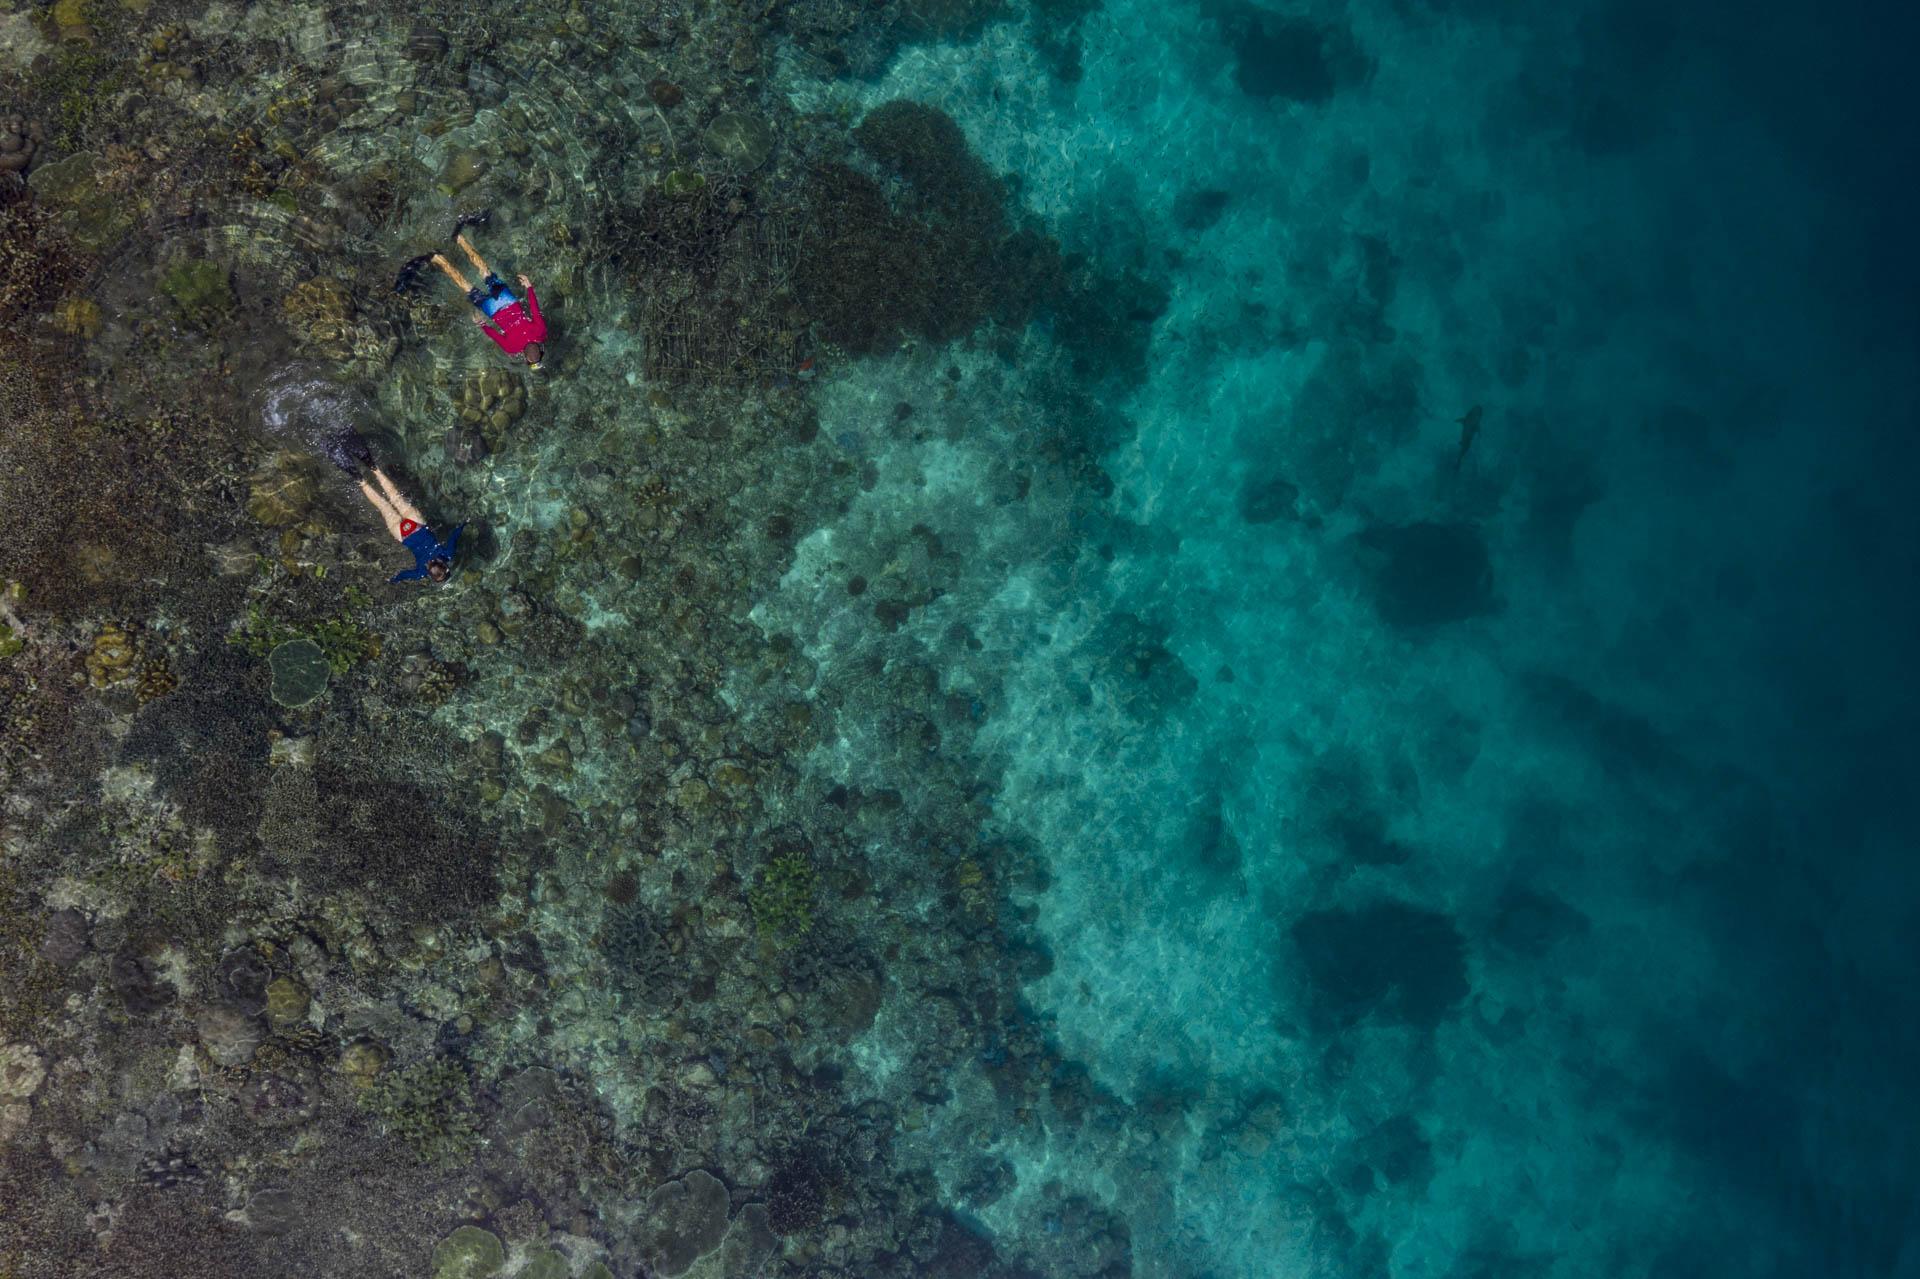 snorkelers over coral reef